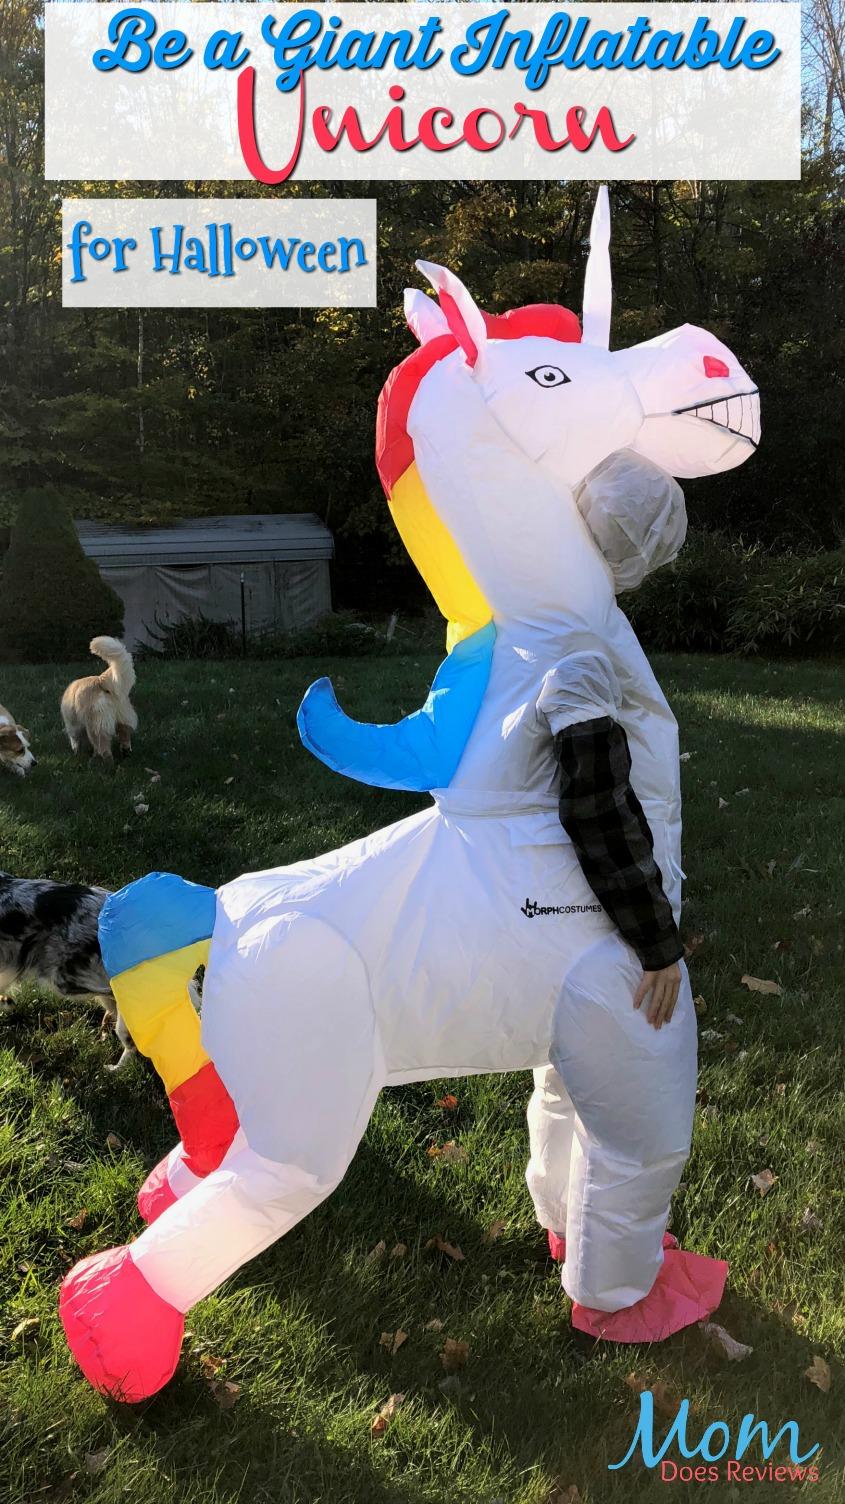 Wear a Giant Inflatable Unicorn for Halloween! #FunHalloween18